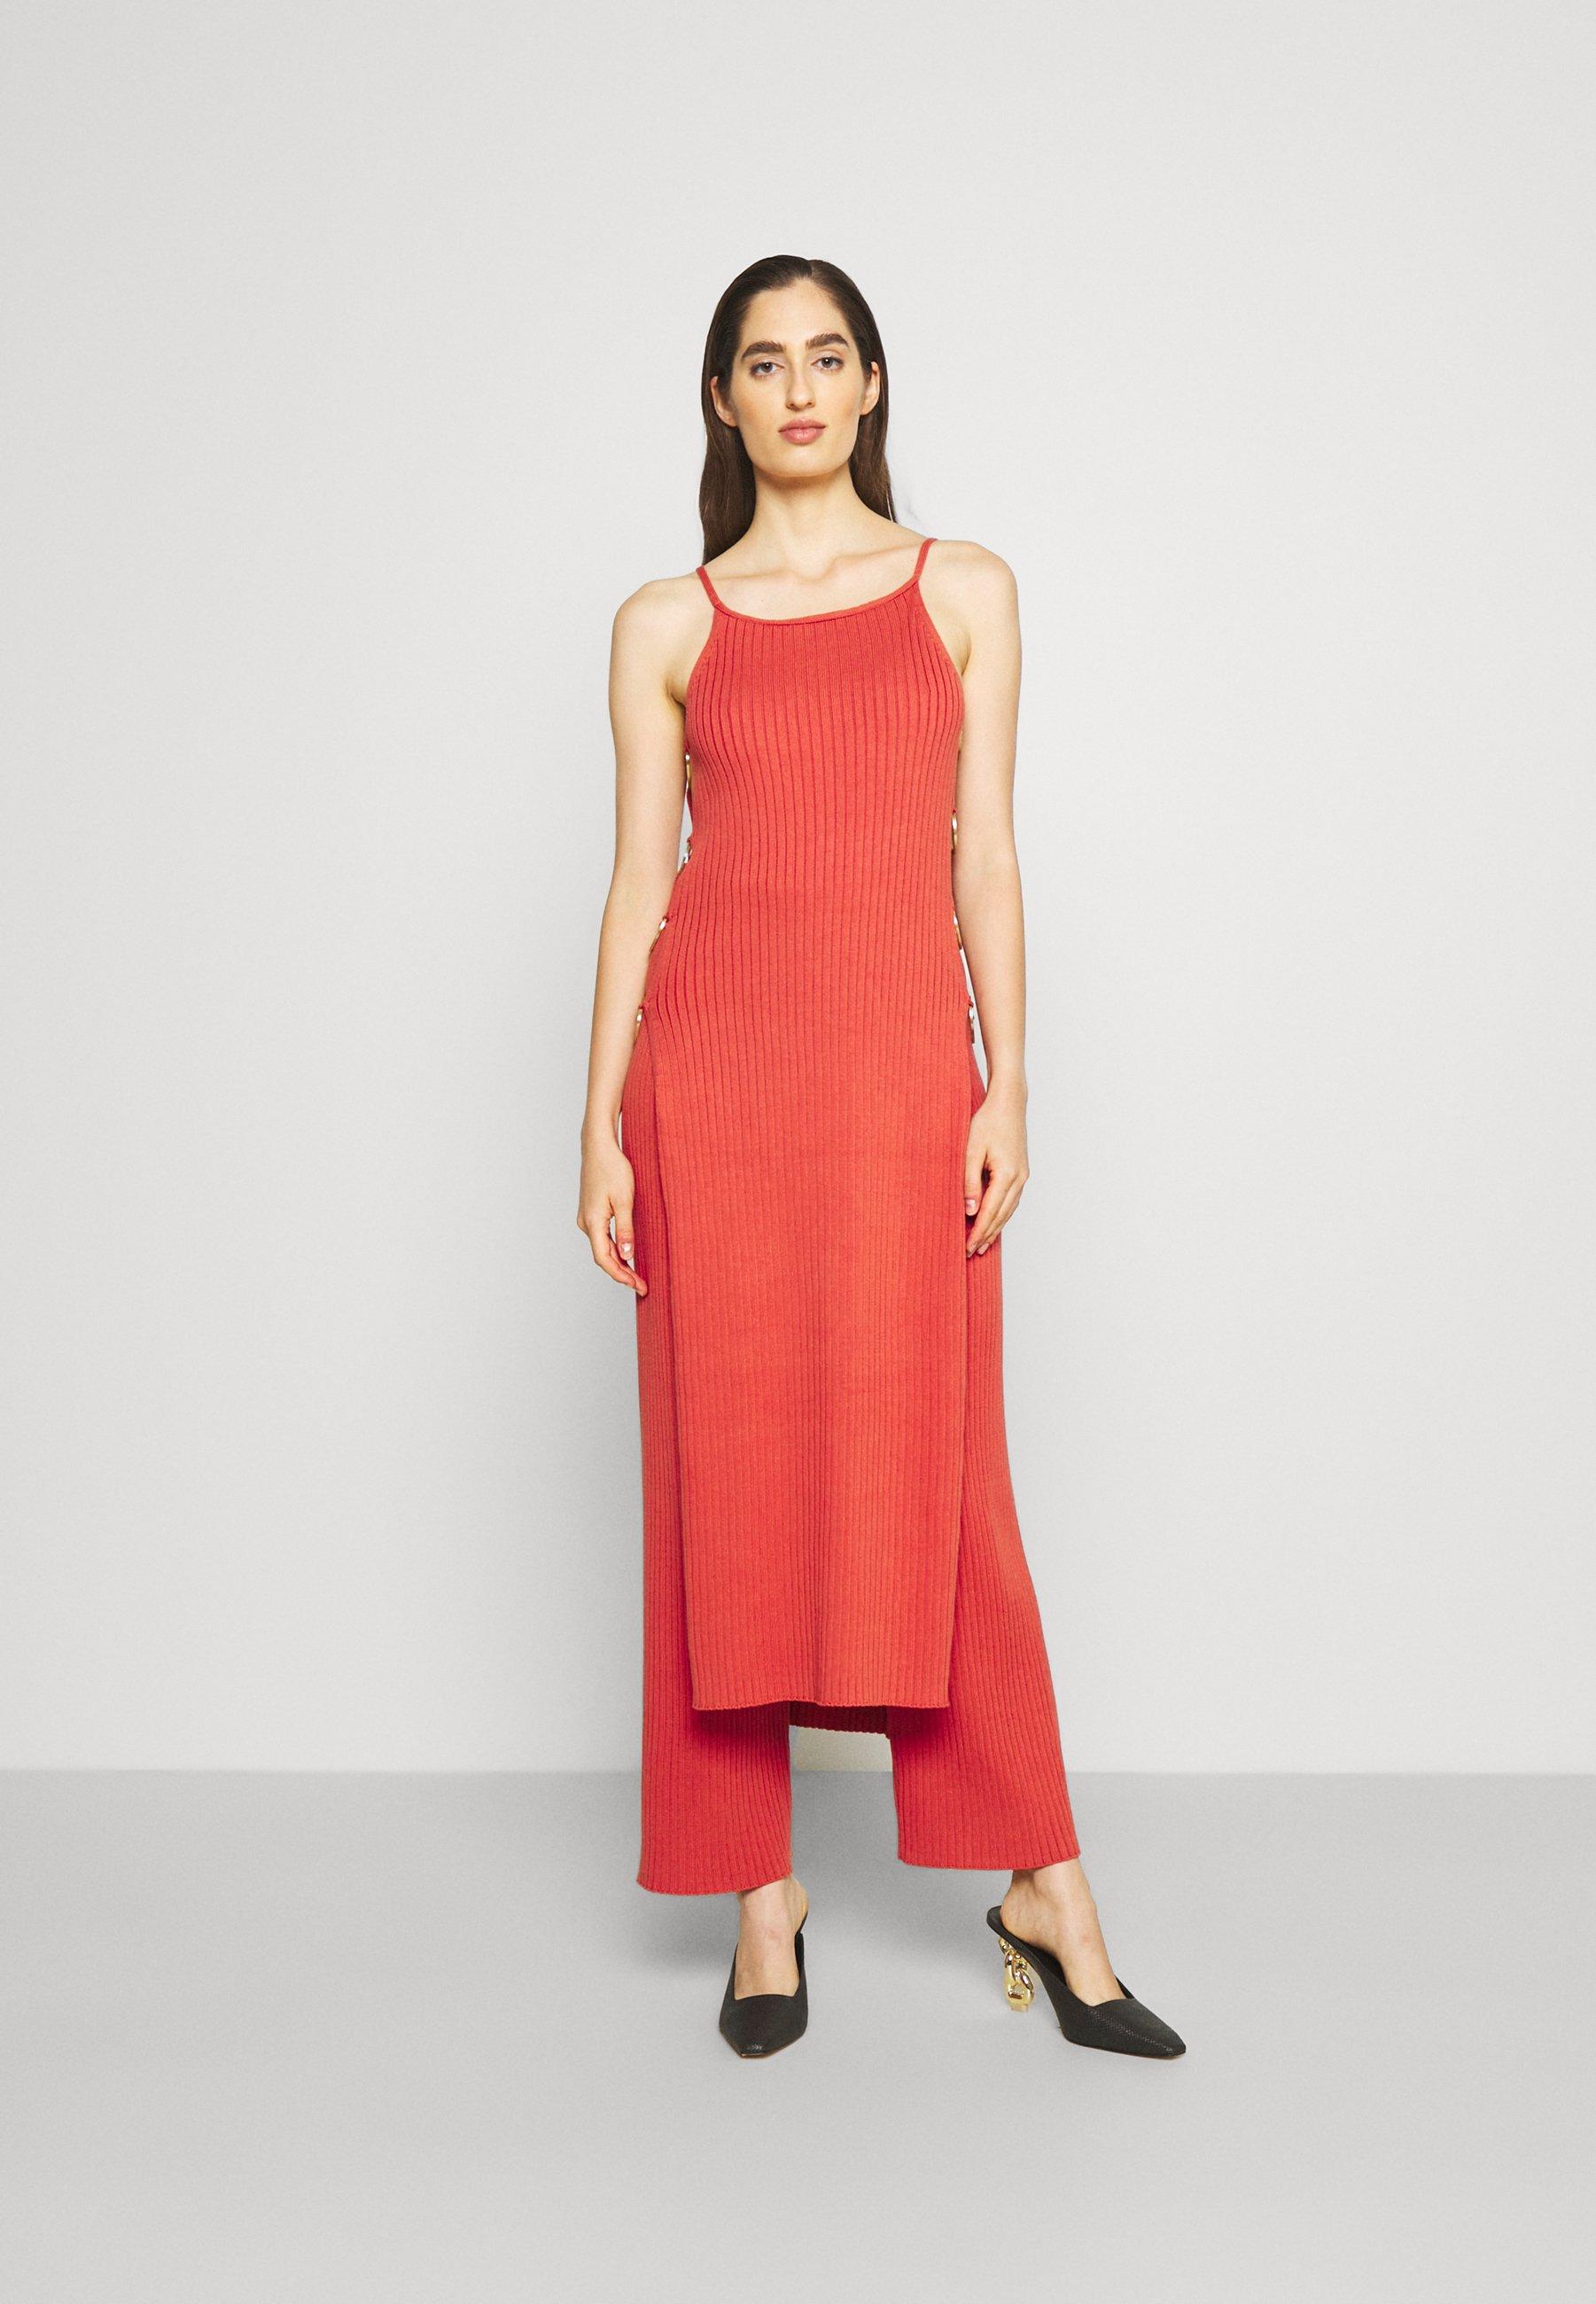 Femme JAMMY DRESS - Robe pull